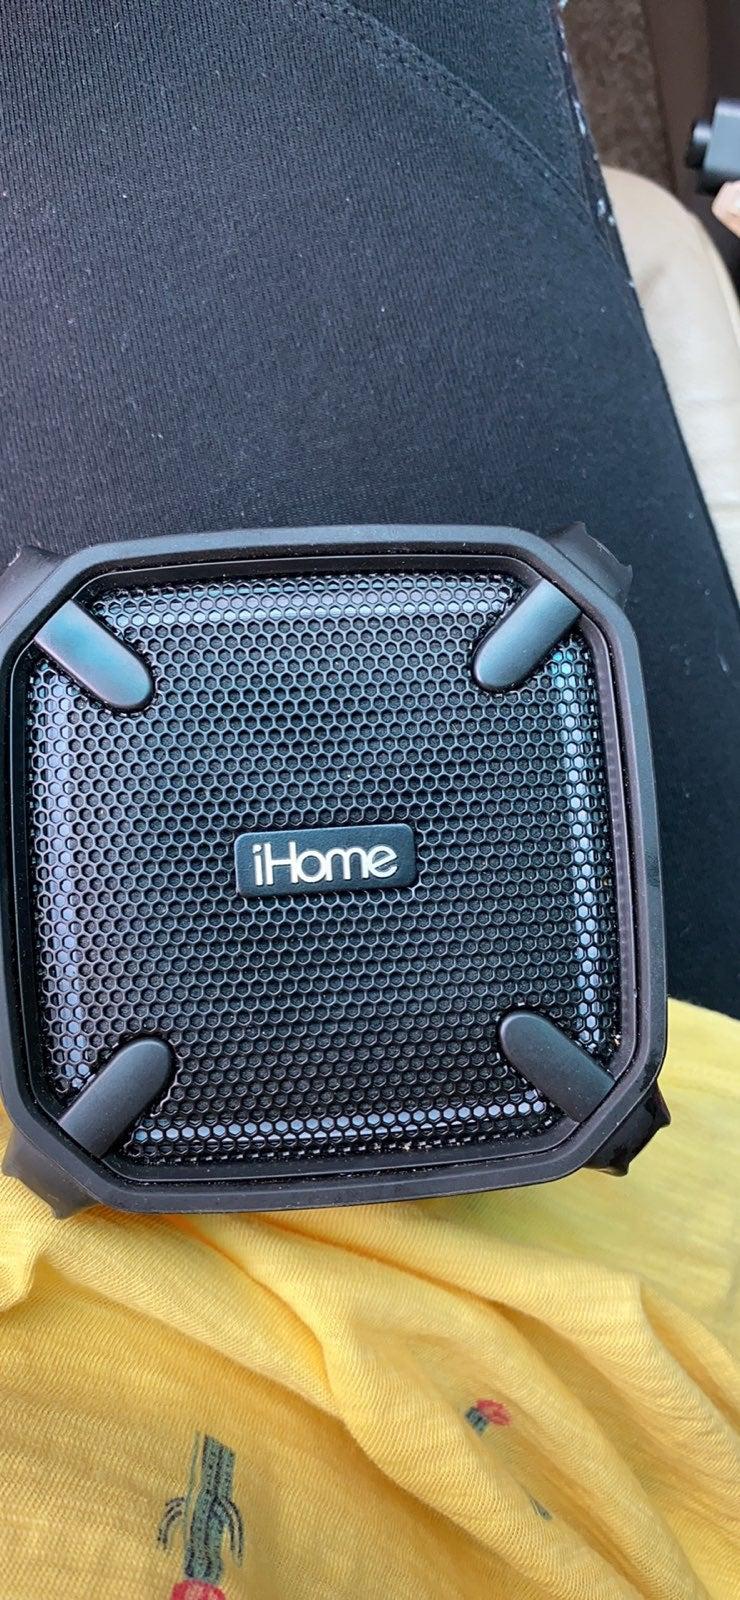 iHome bluetooth speaker